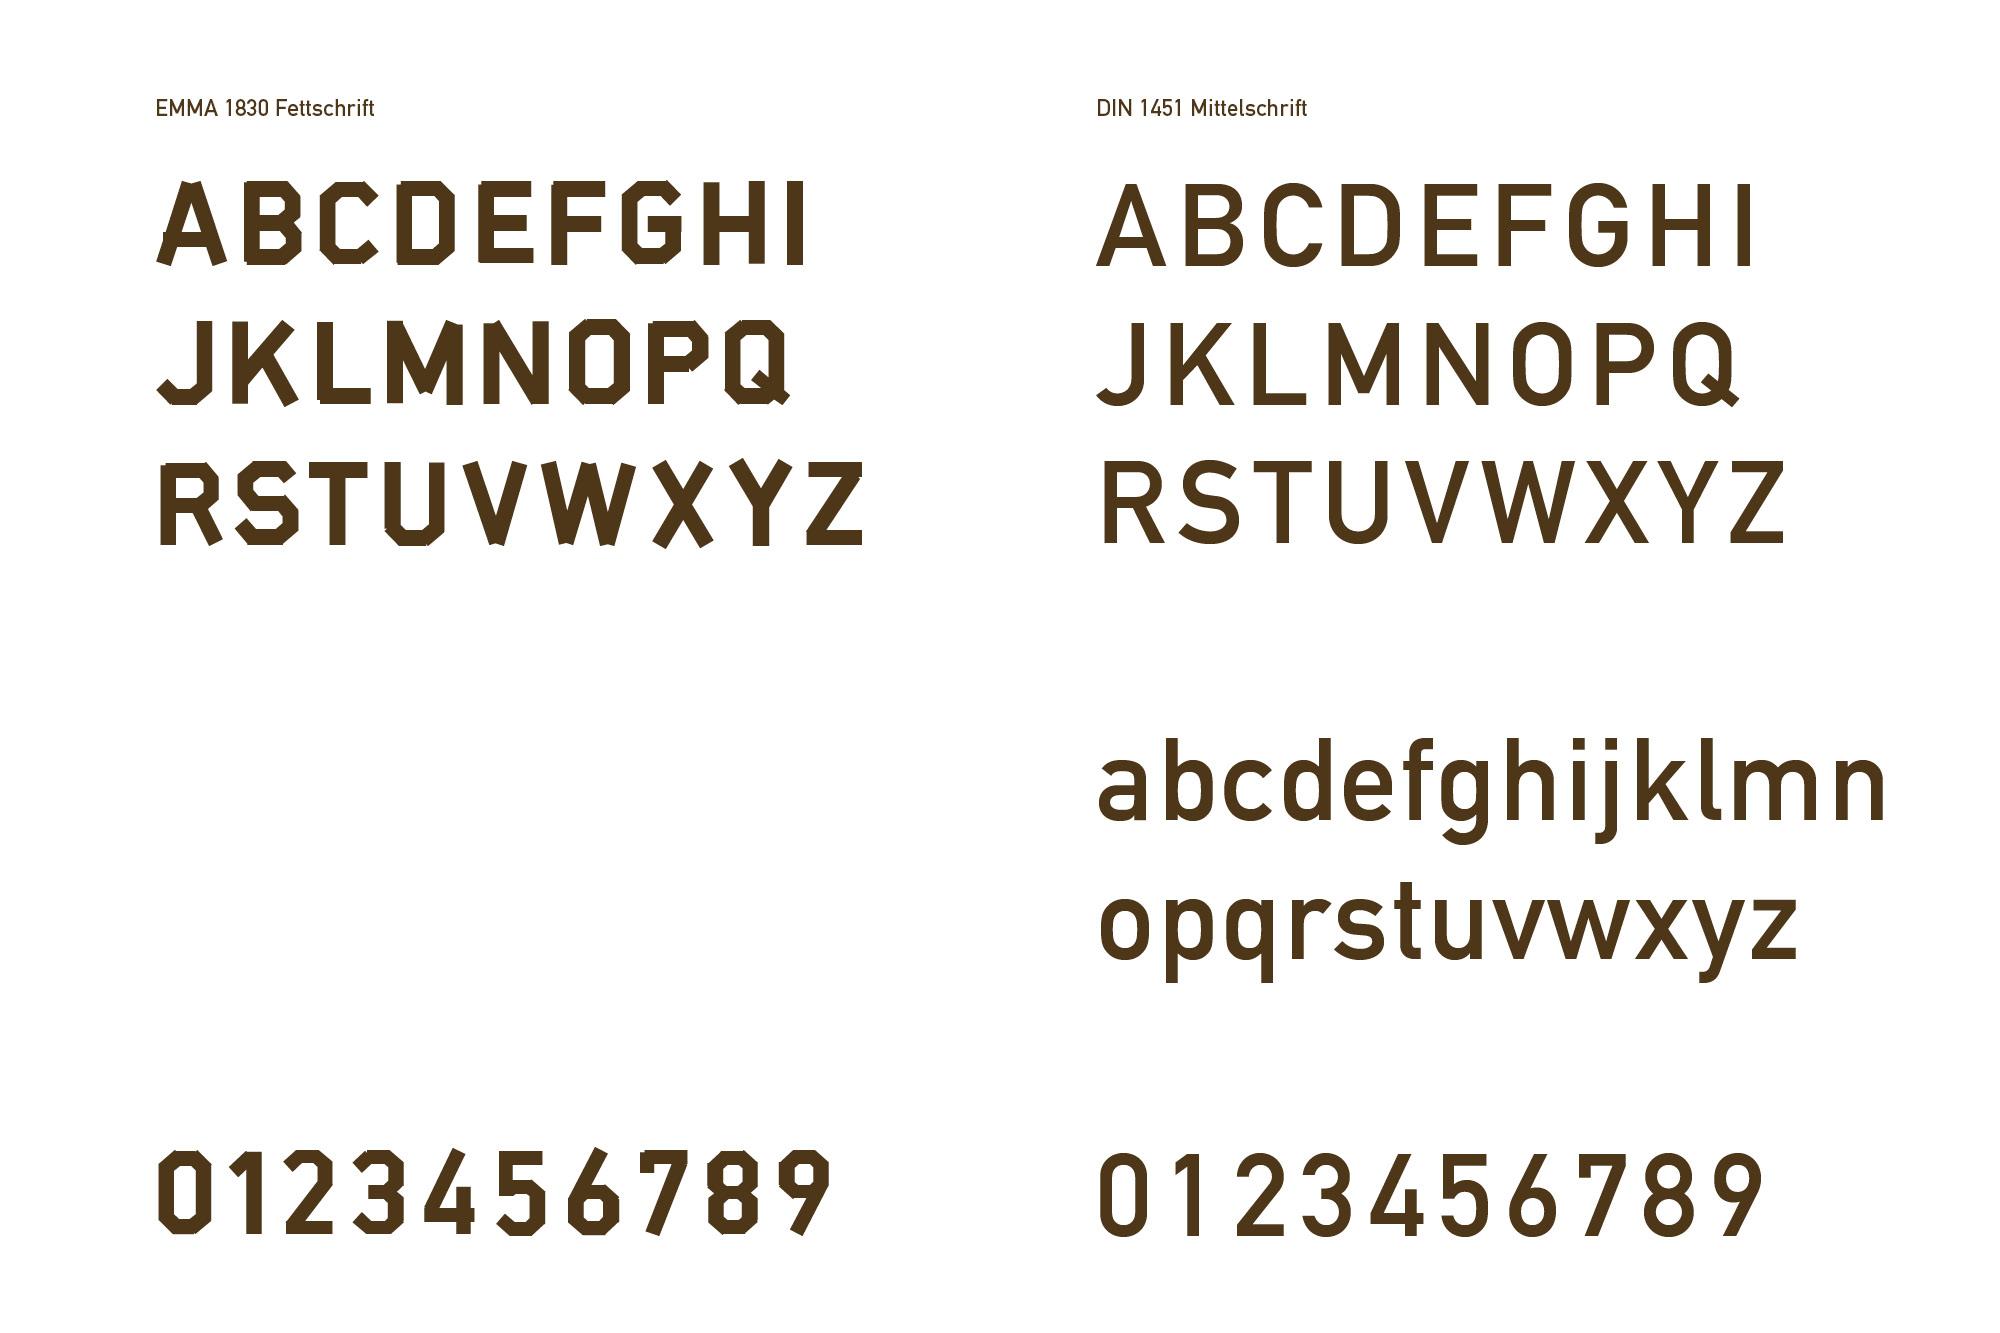 cobra-emma-pforzheim-corporate-design-schriftbild